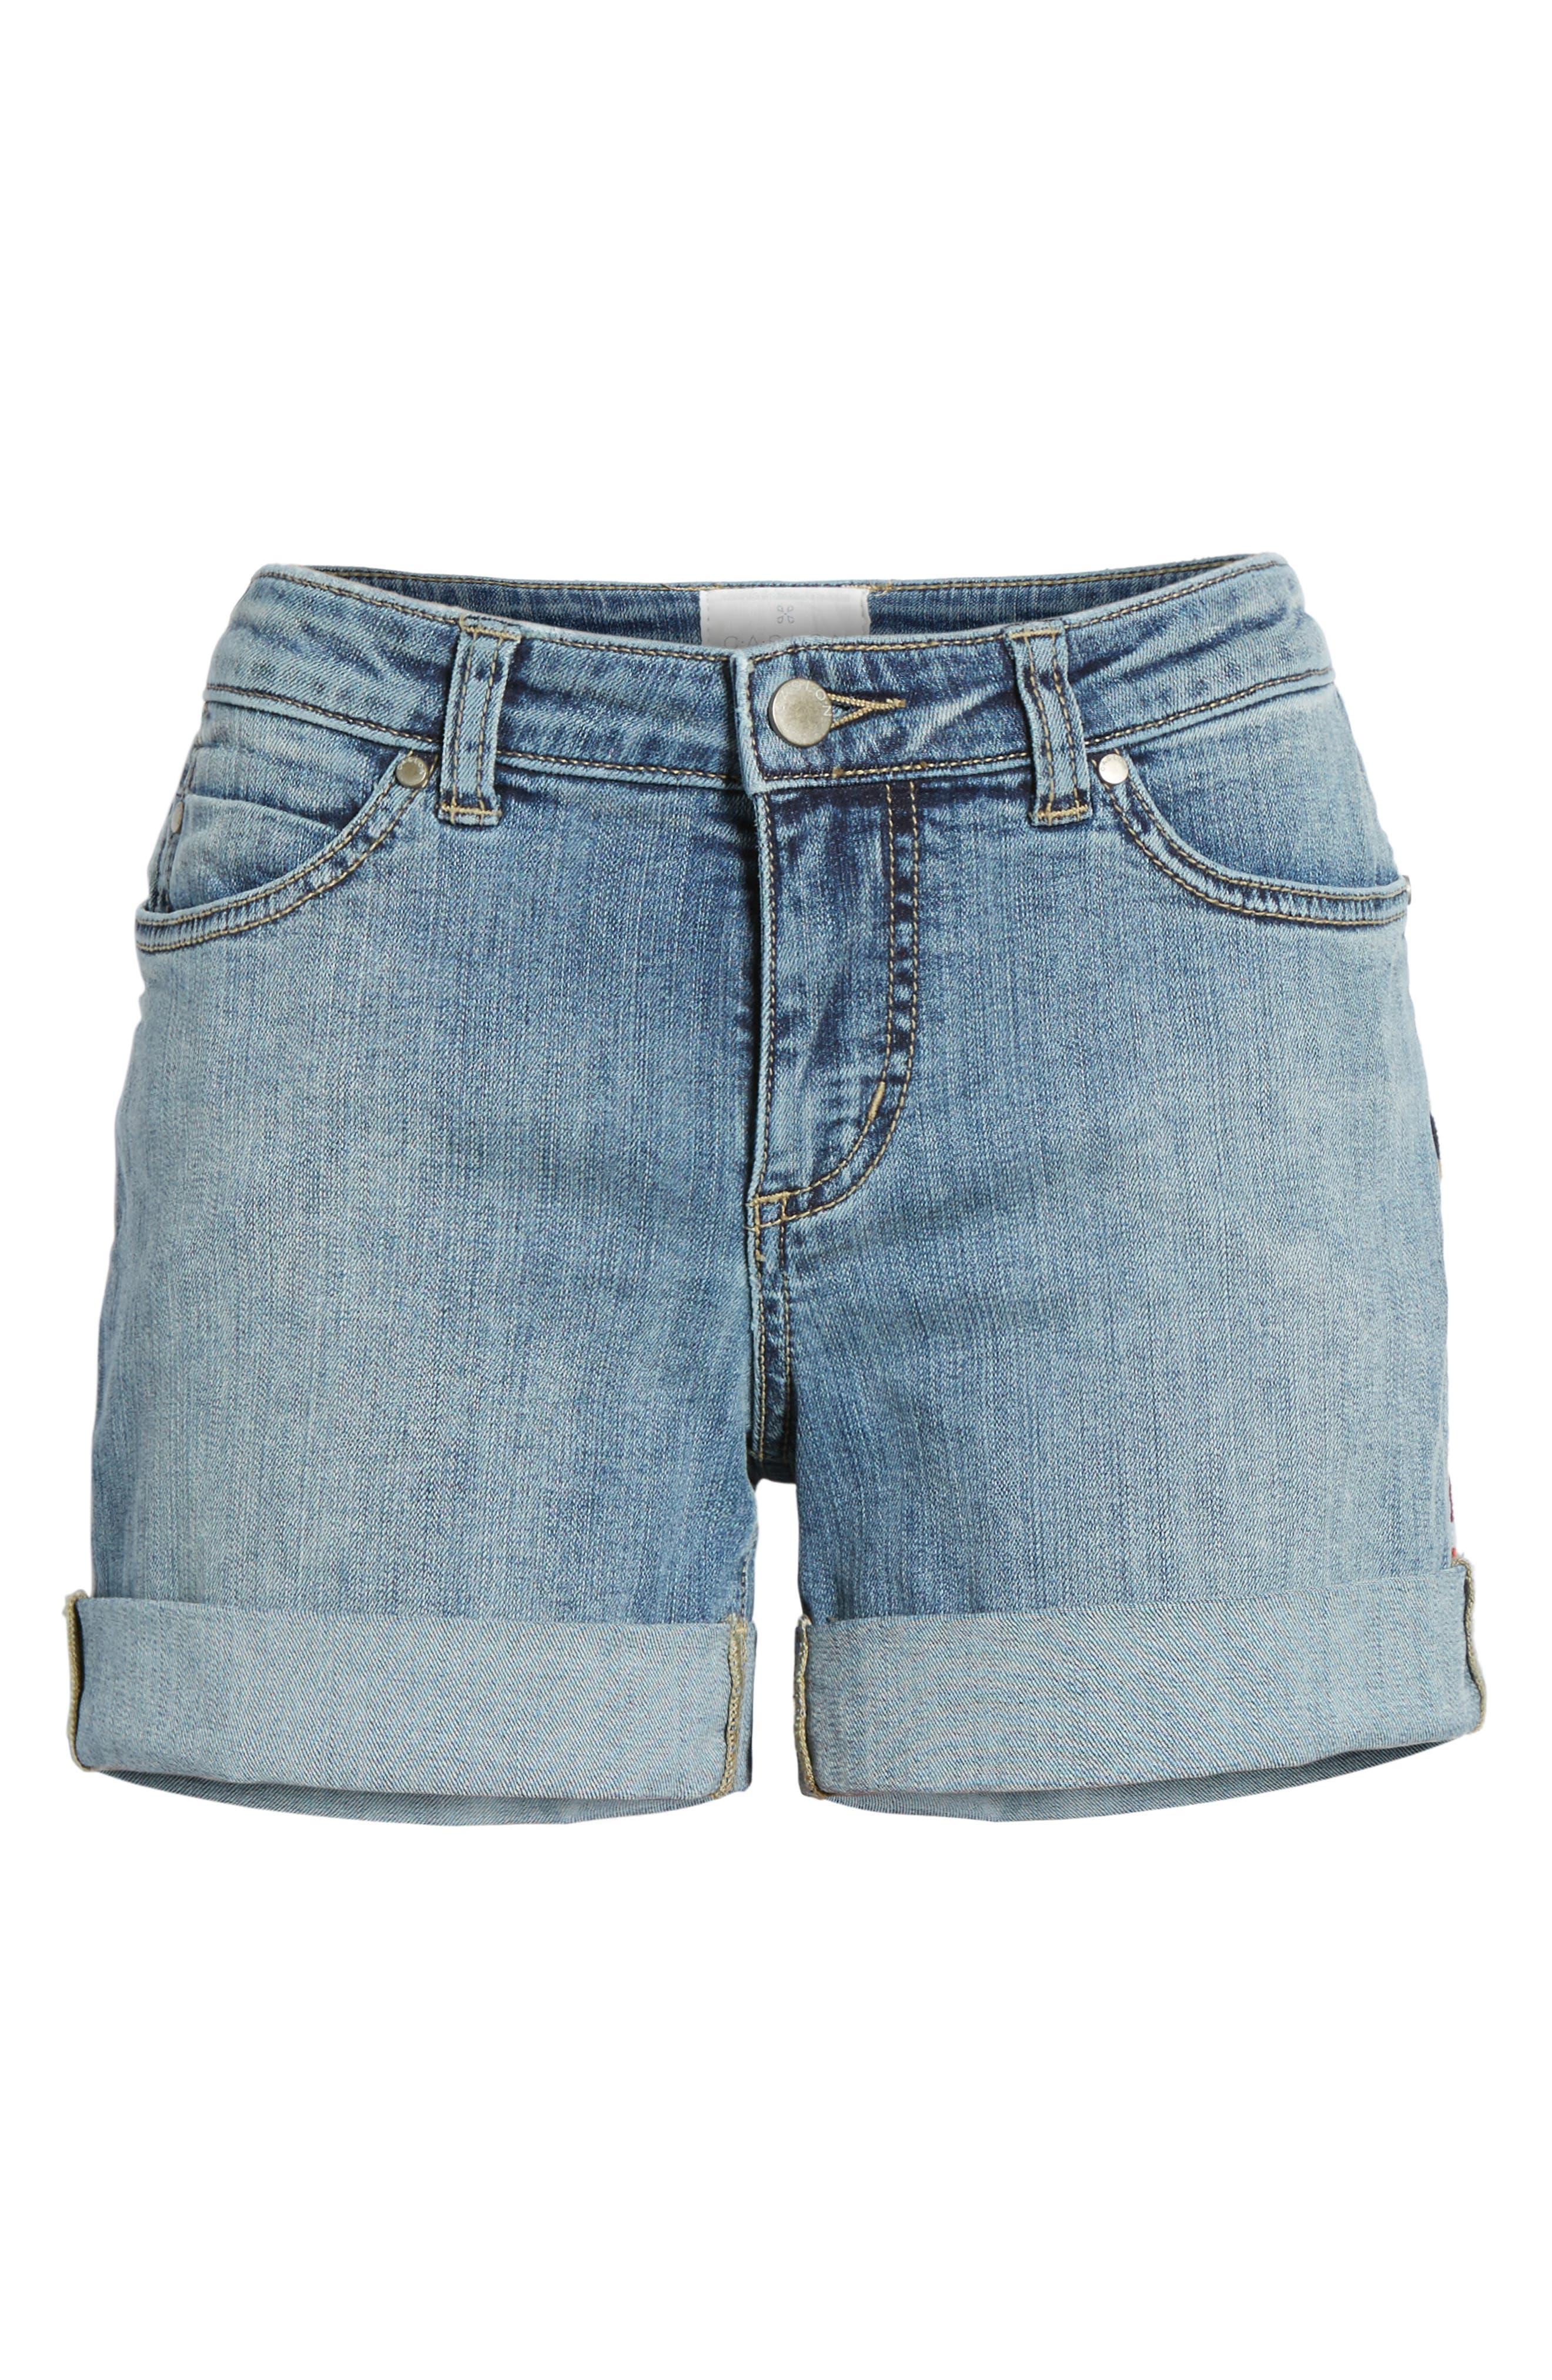 Embroidered Seam Boyfriend Denim Shorts,                             Alternate thumbnail 6, color,                             Sunspot Wash